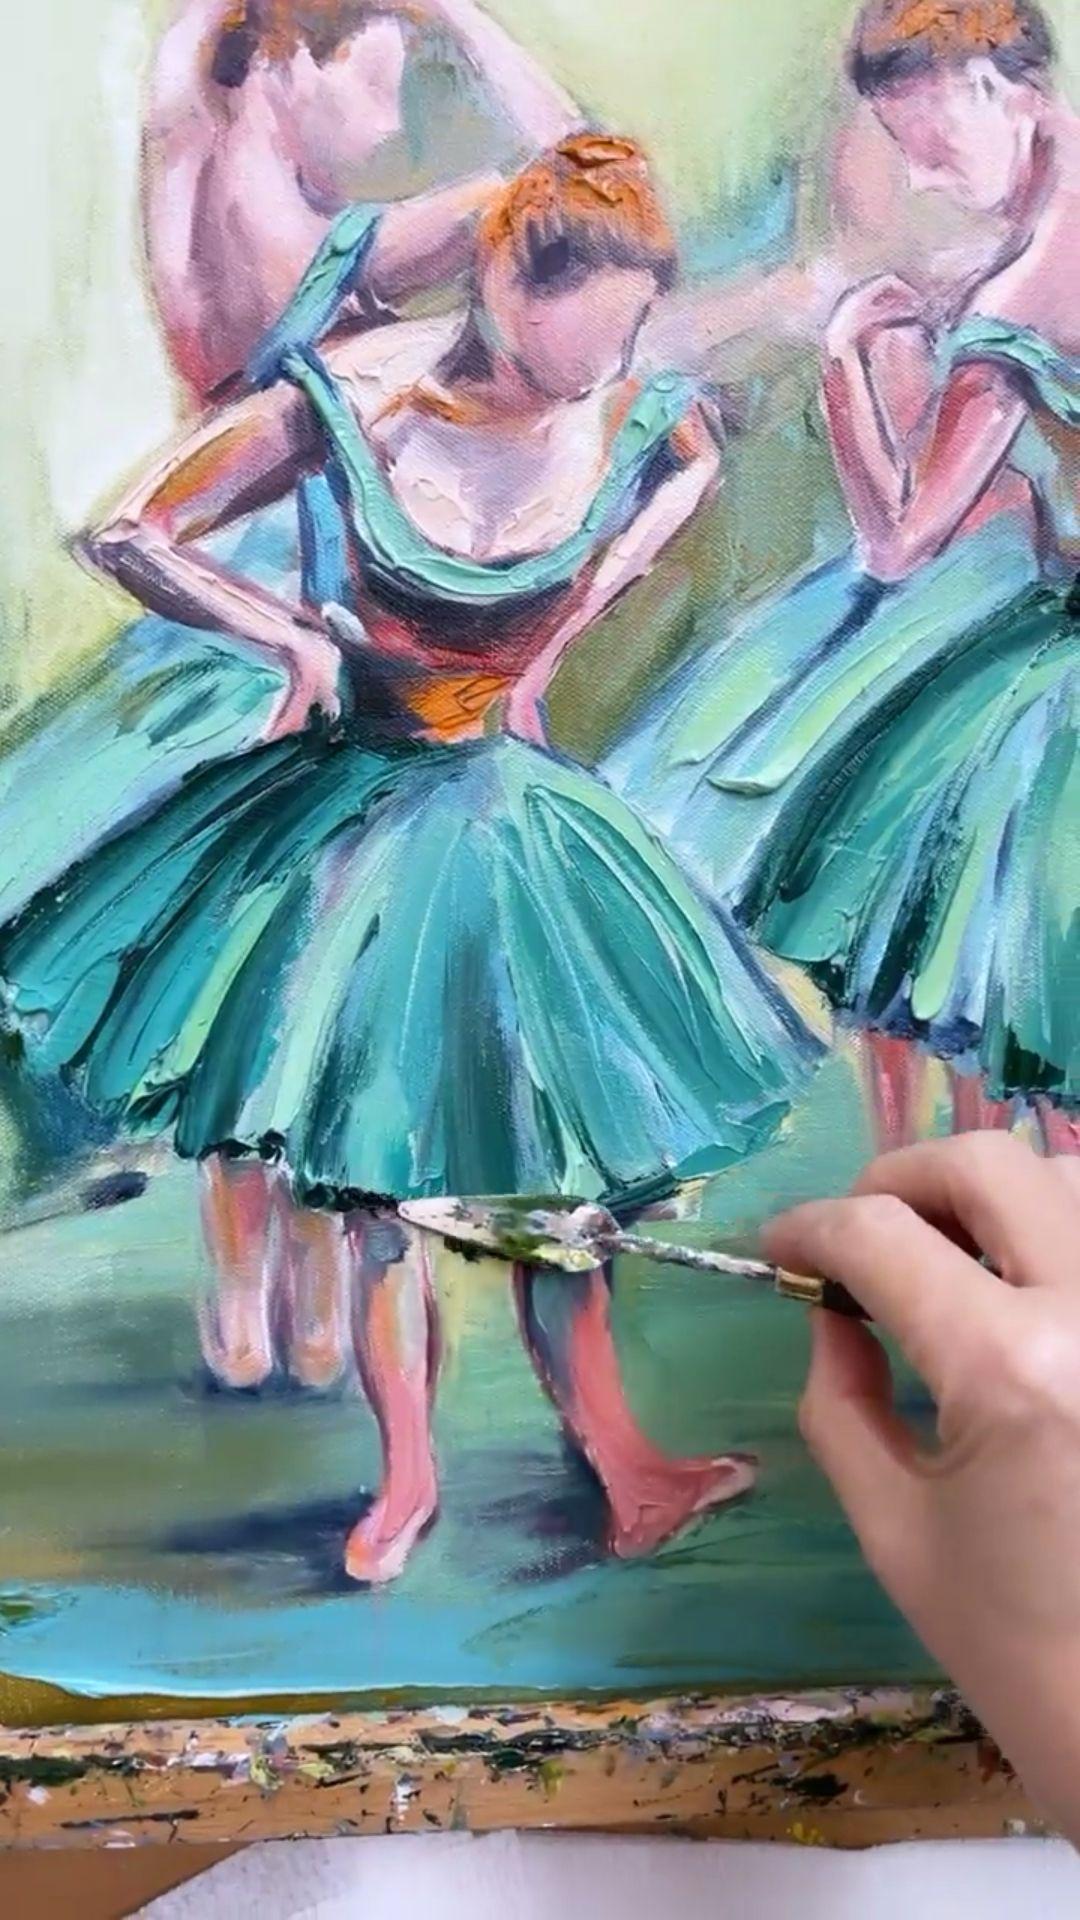 Degas inspired painting